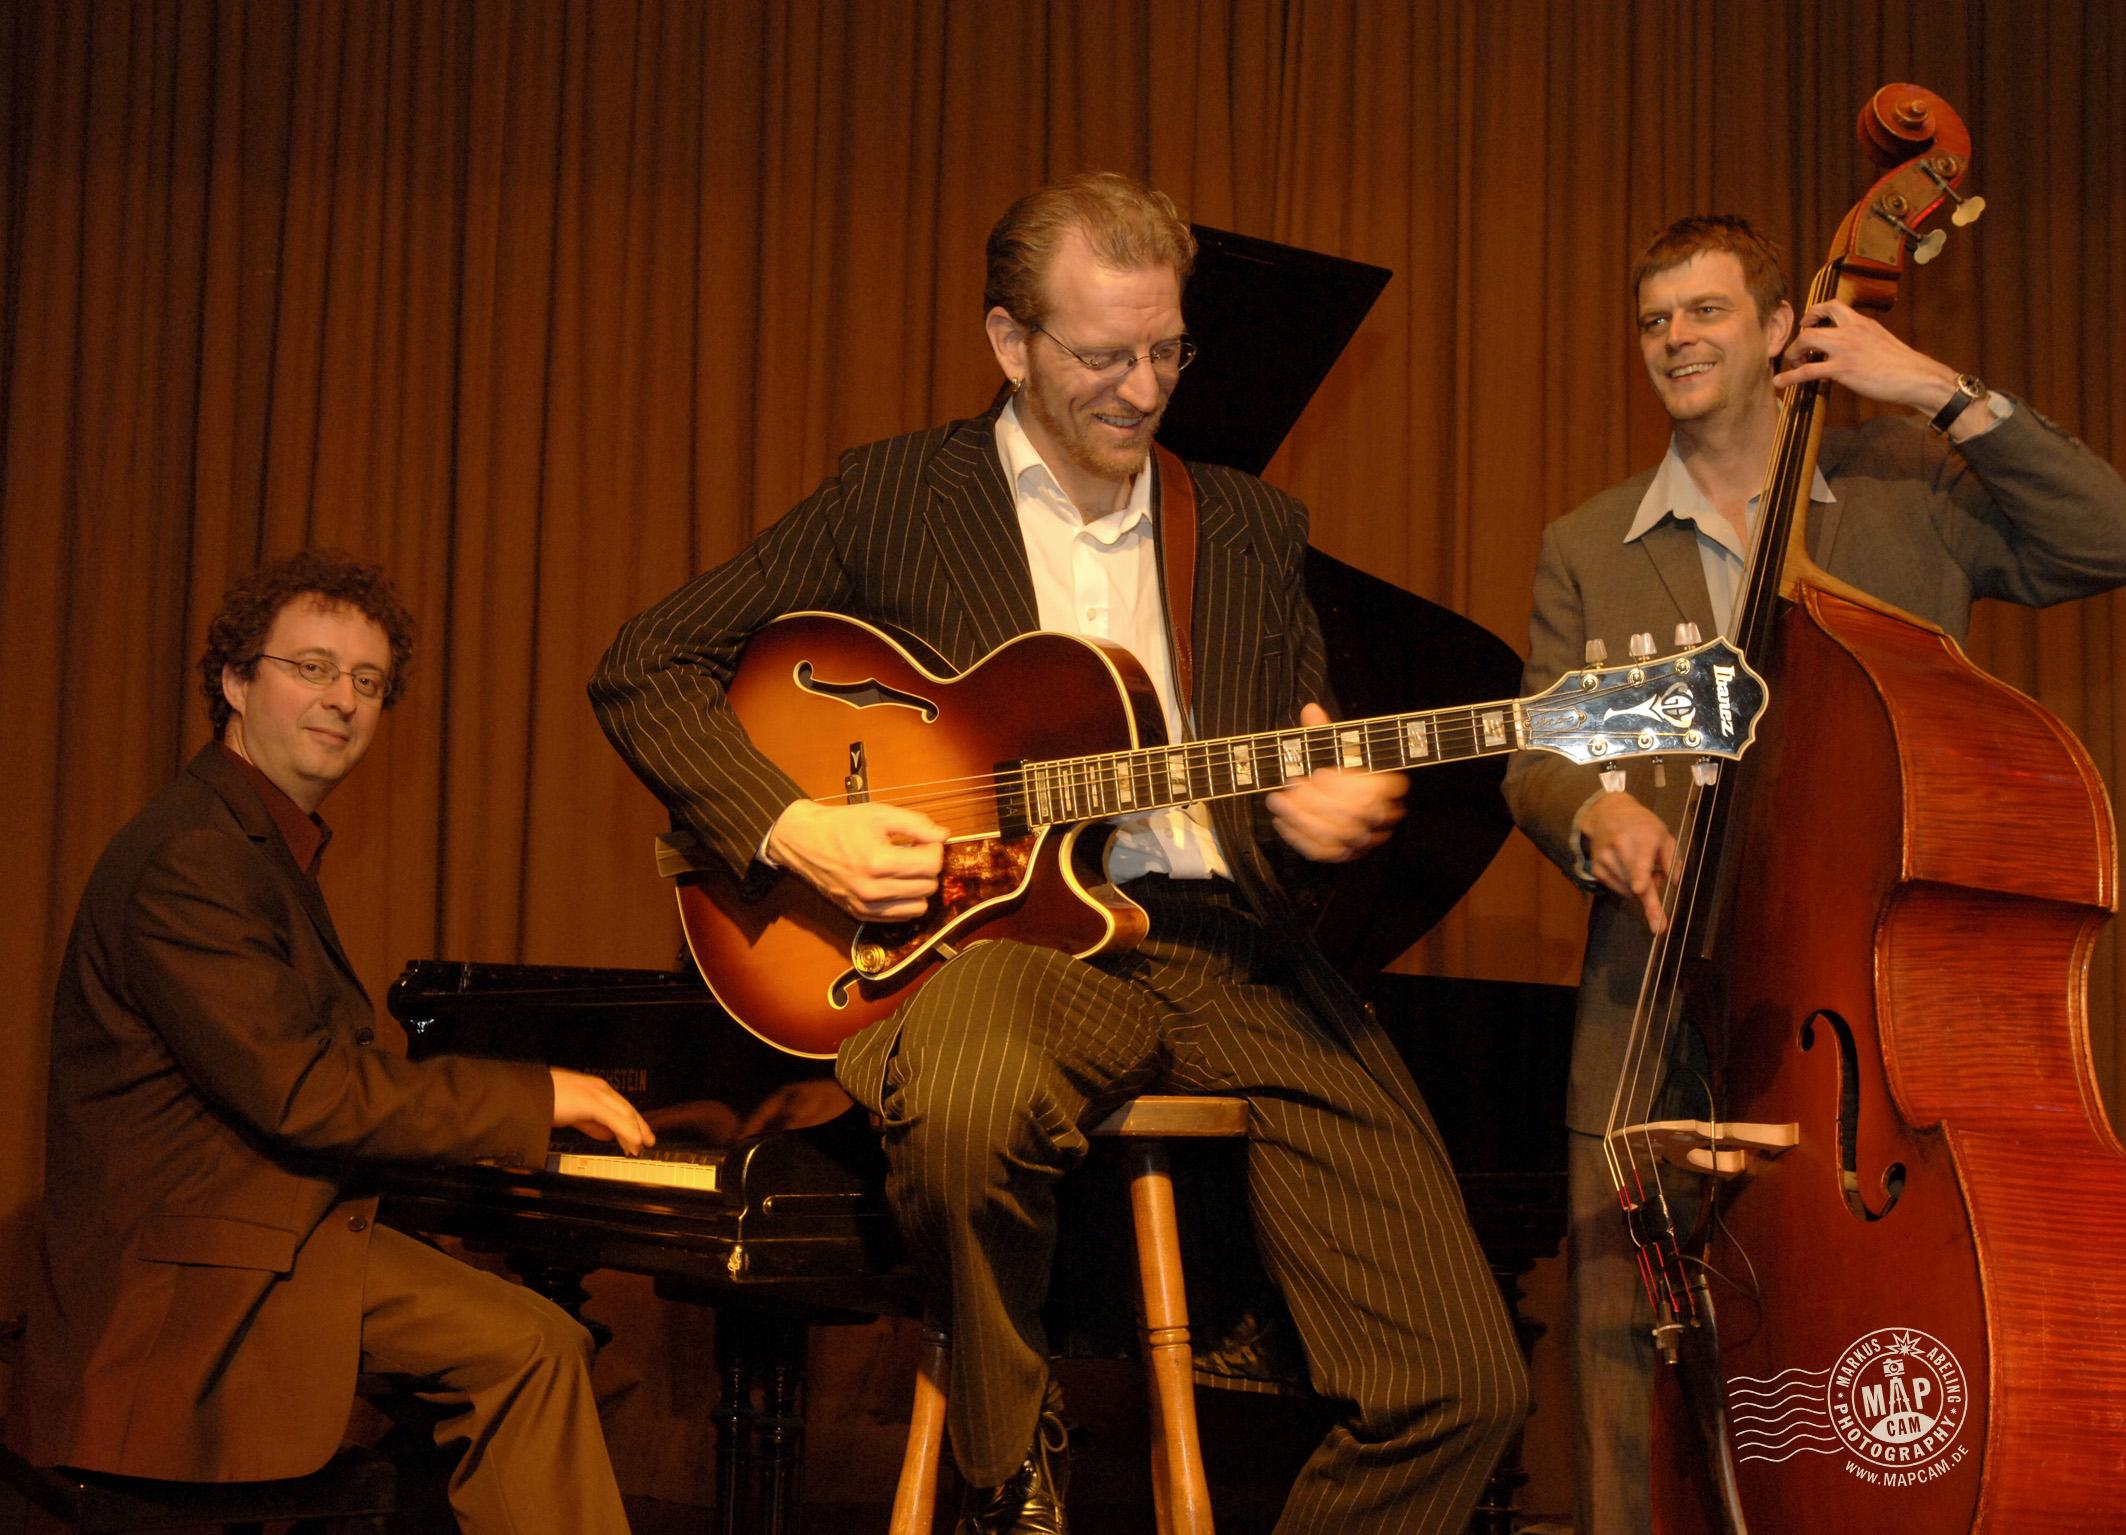 Jörg Seidel Trio